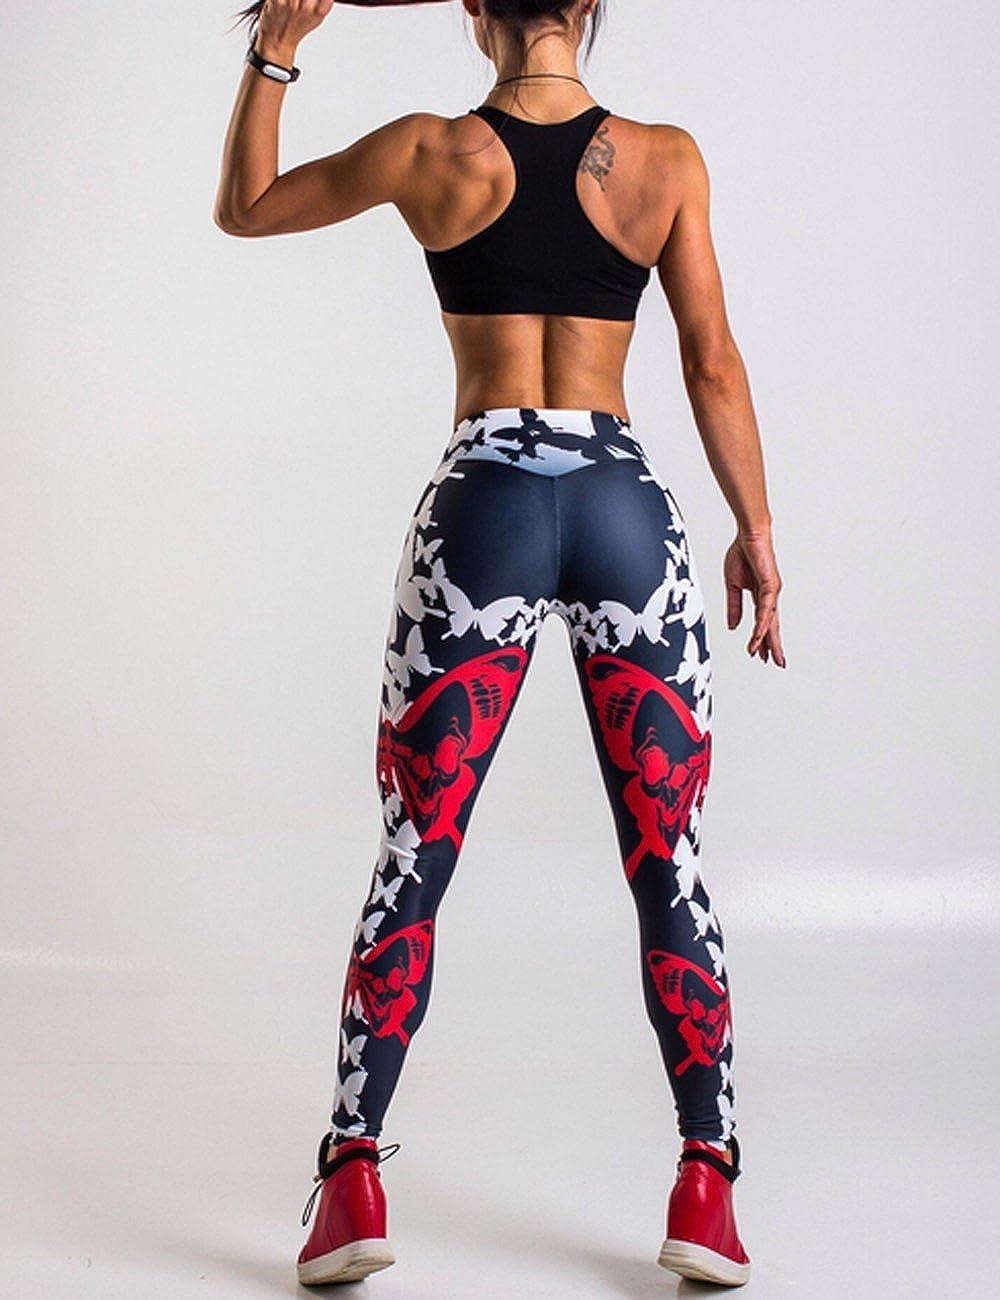 0463ce92f61553 Rachel Charm Womens Yoga Workout Gym Print Sports Pants Leggings Fitness  Stretch Trouser at Amazon Women's Clothing store: